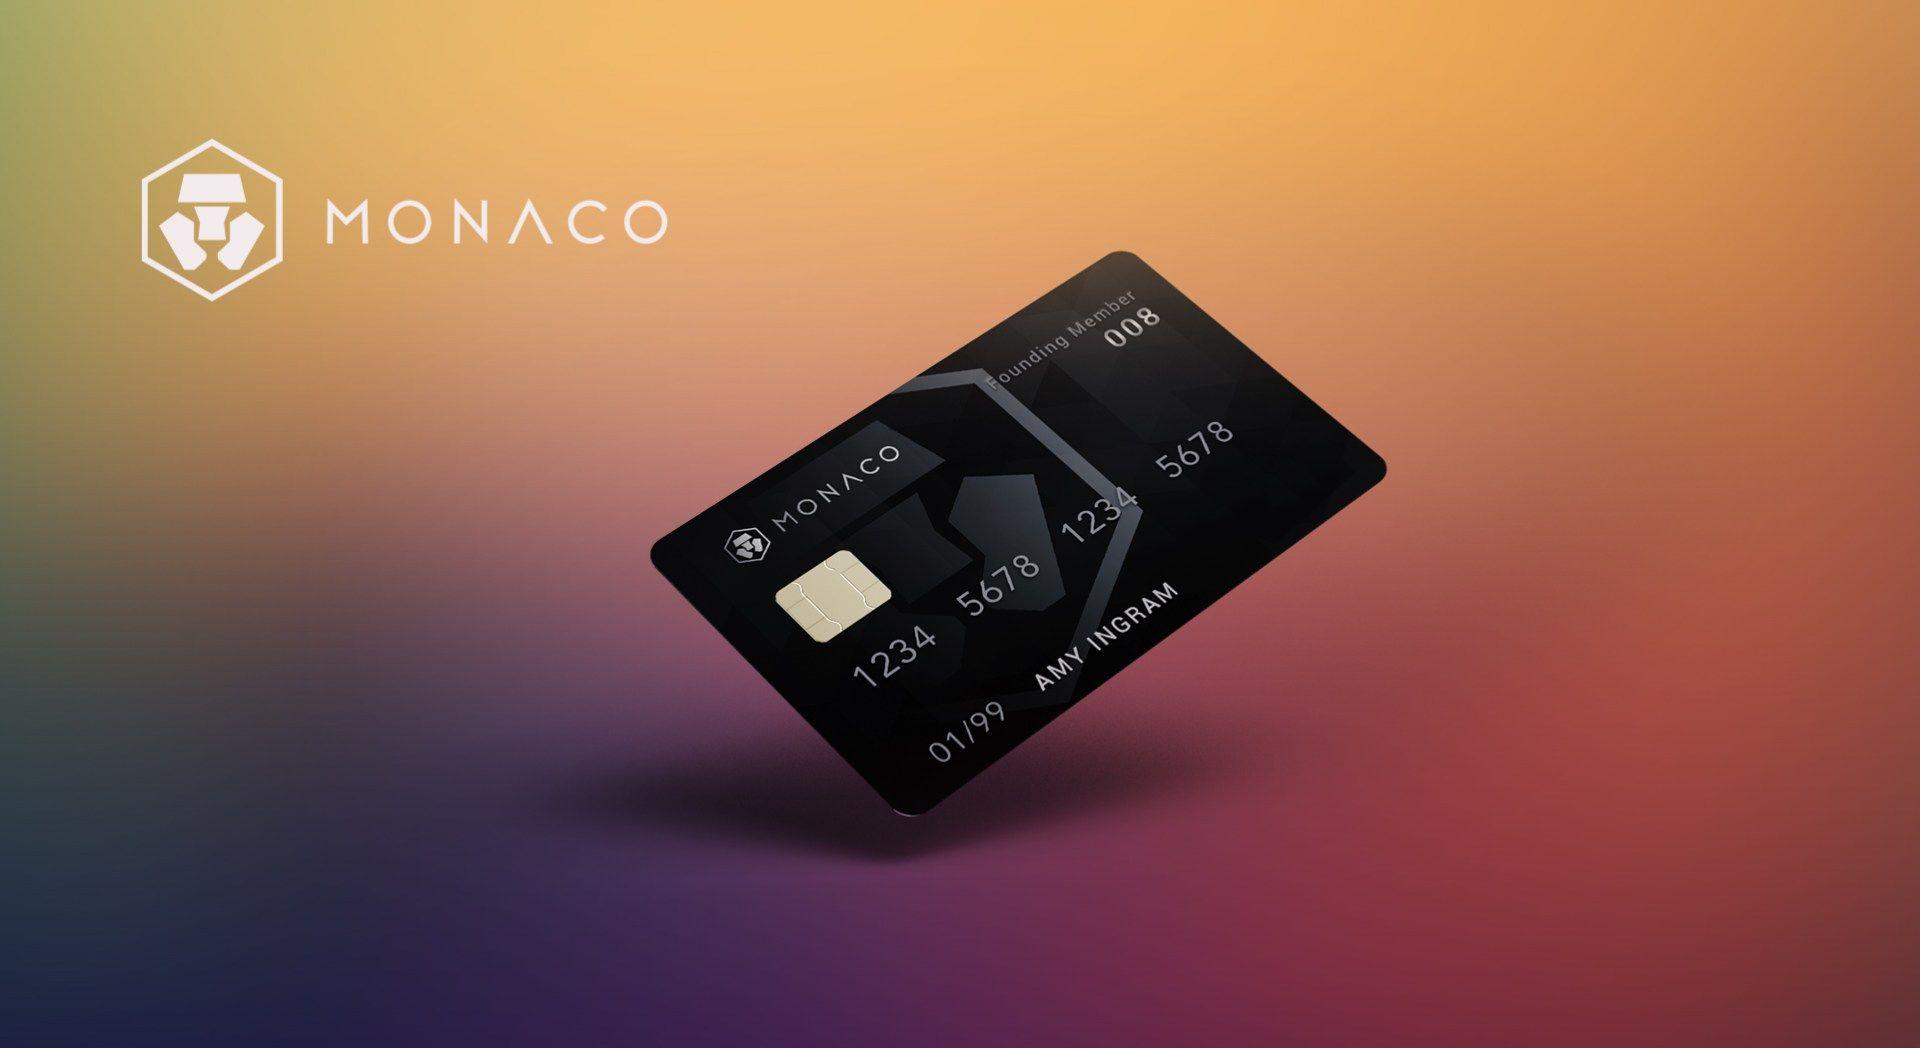 Monaco Card Review The Visa Card Revolution Best